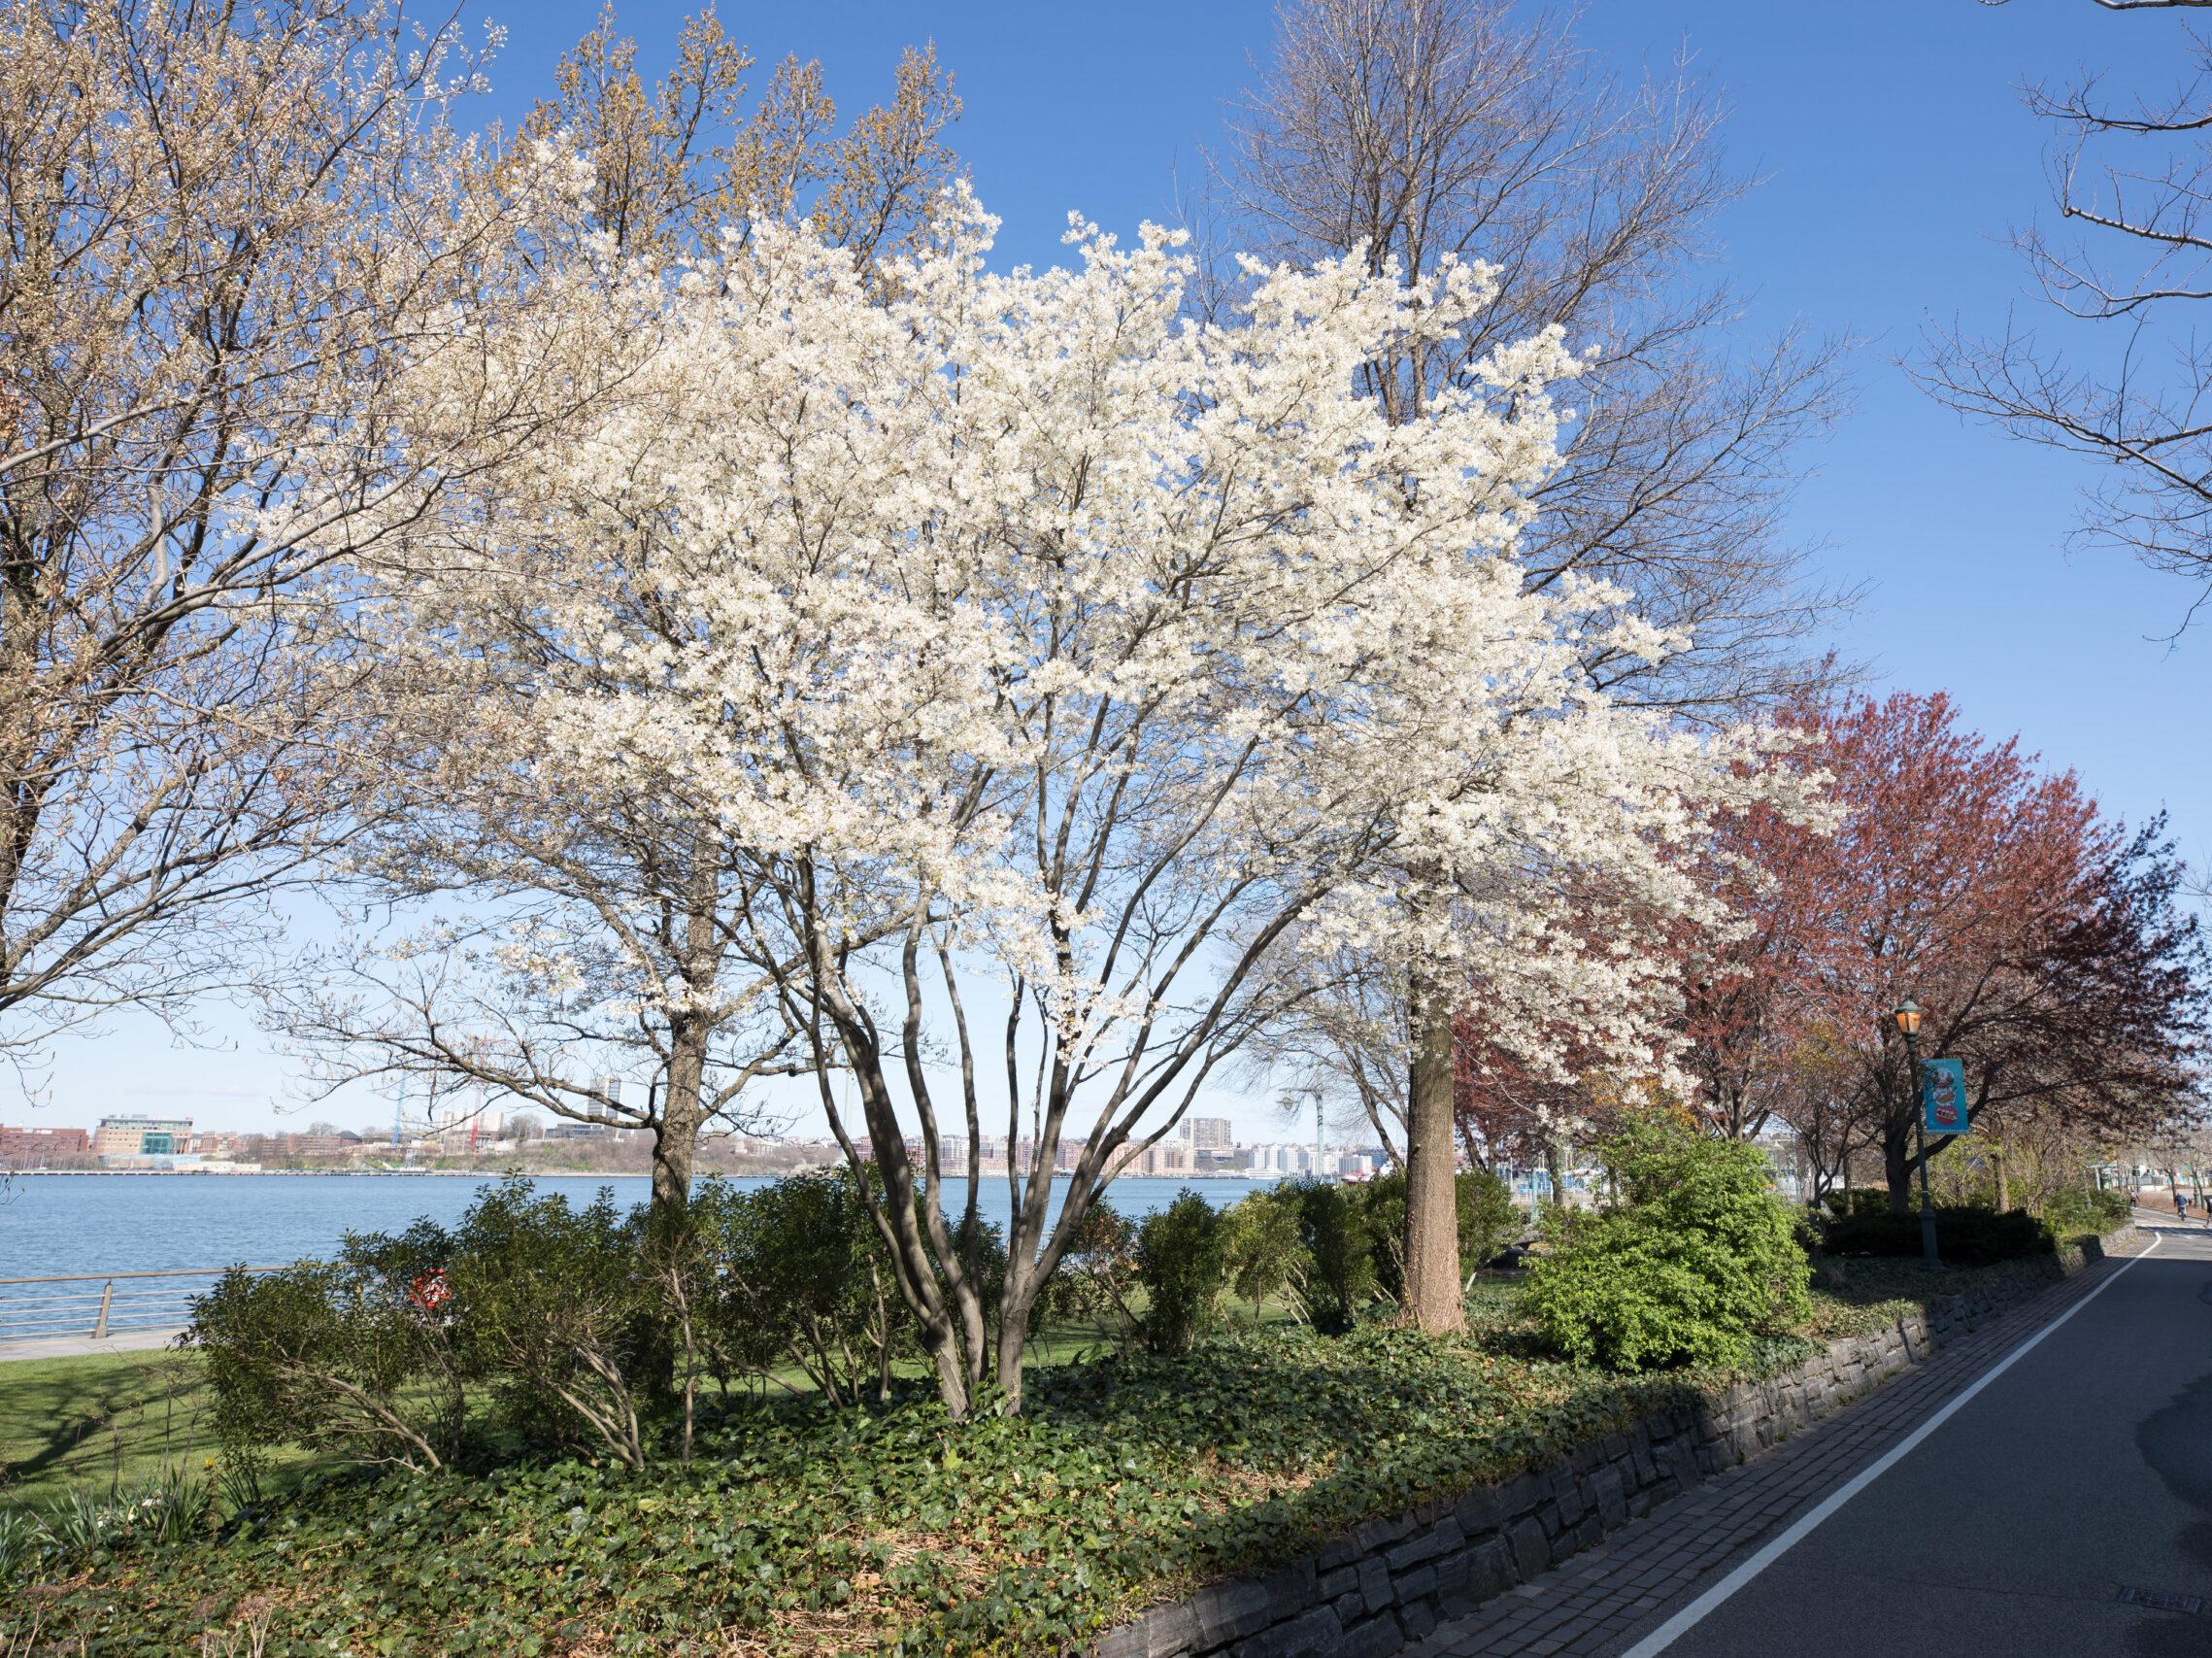 White serviceberry blossoms